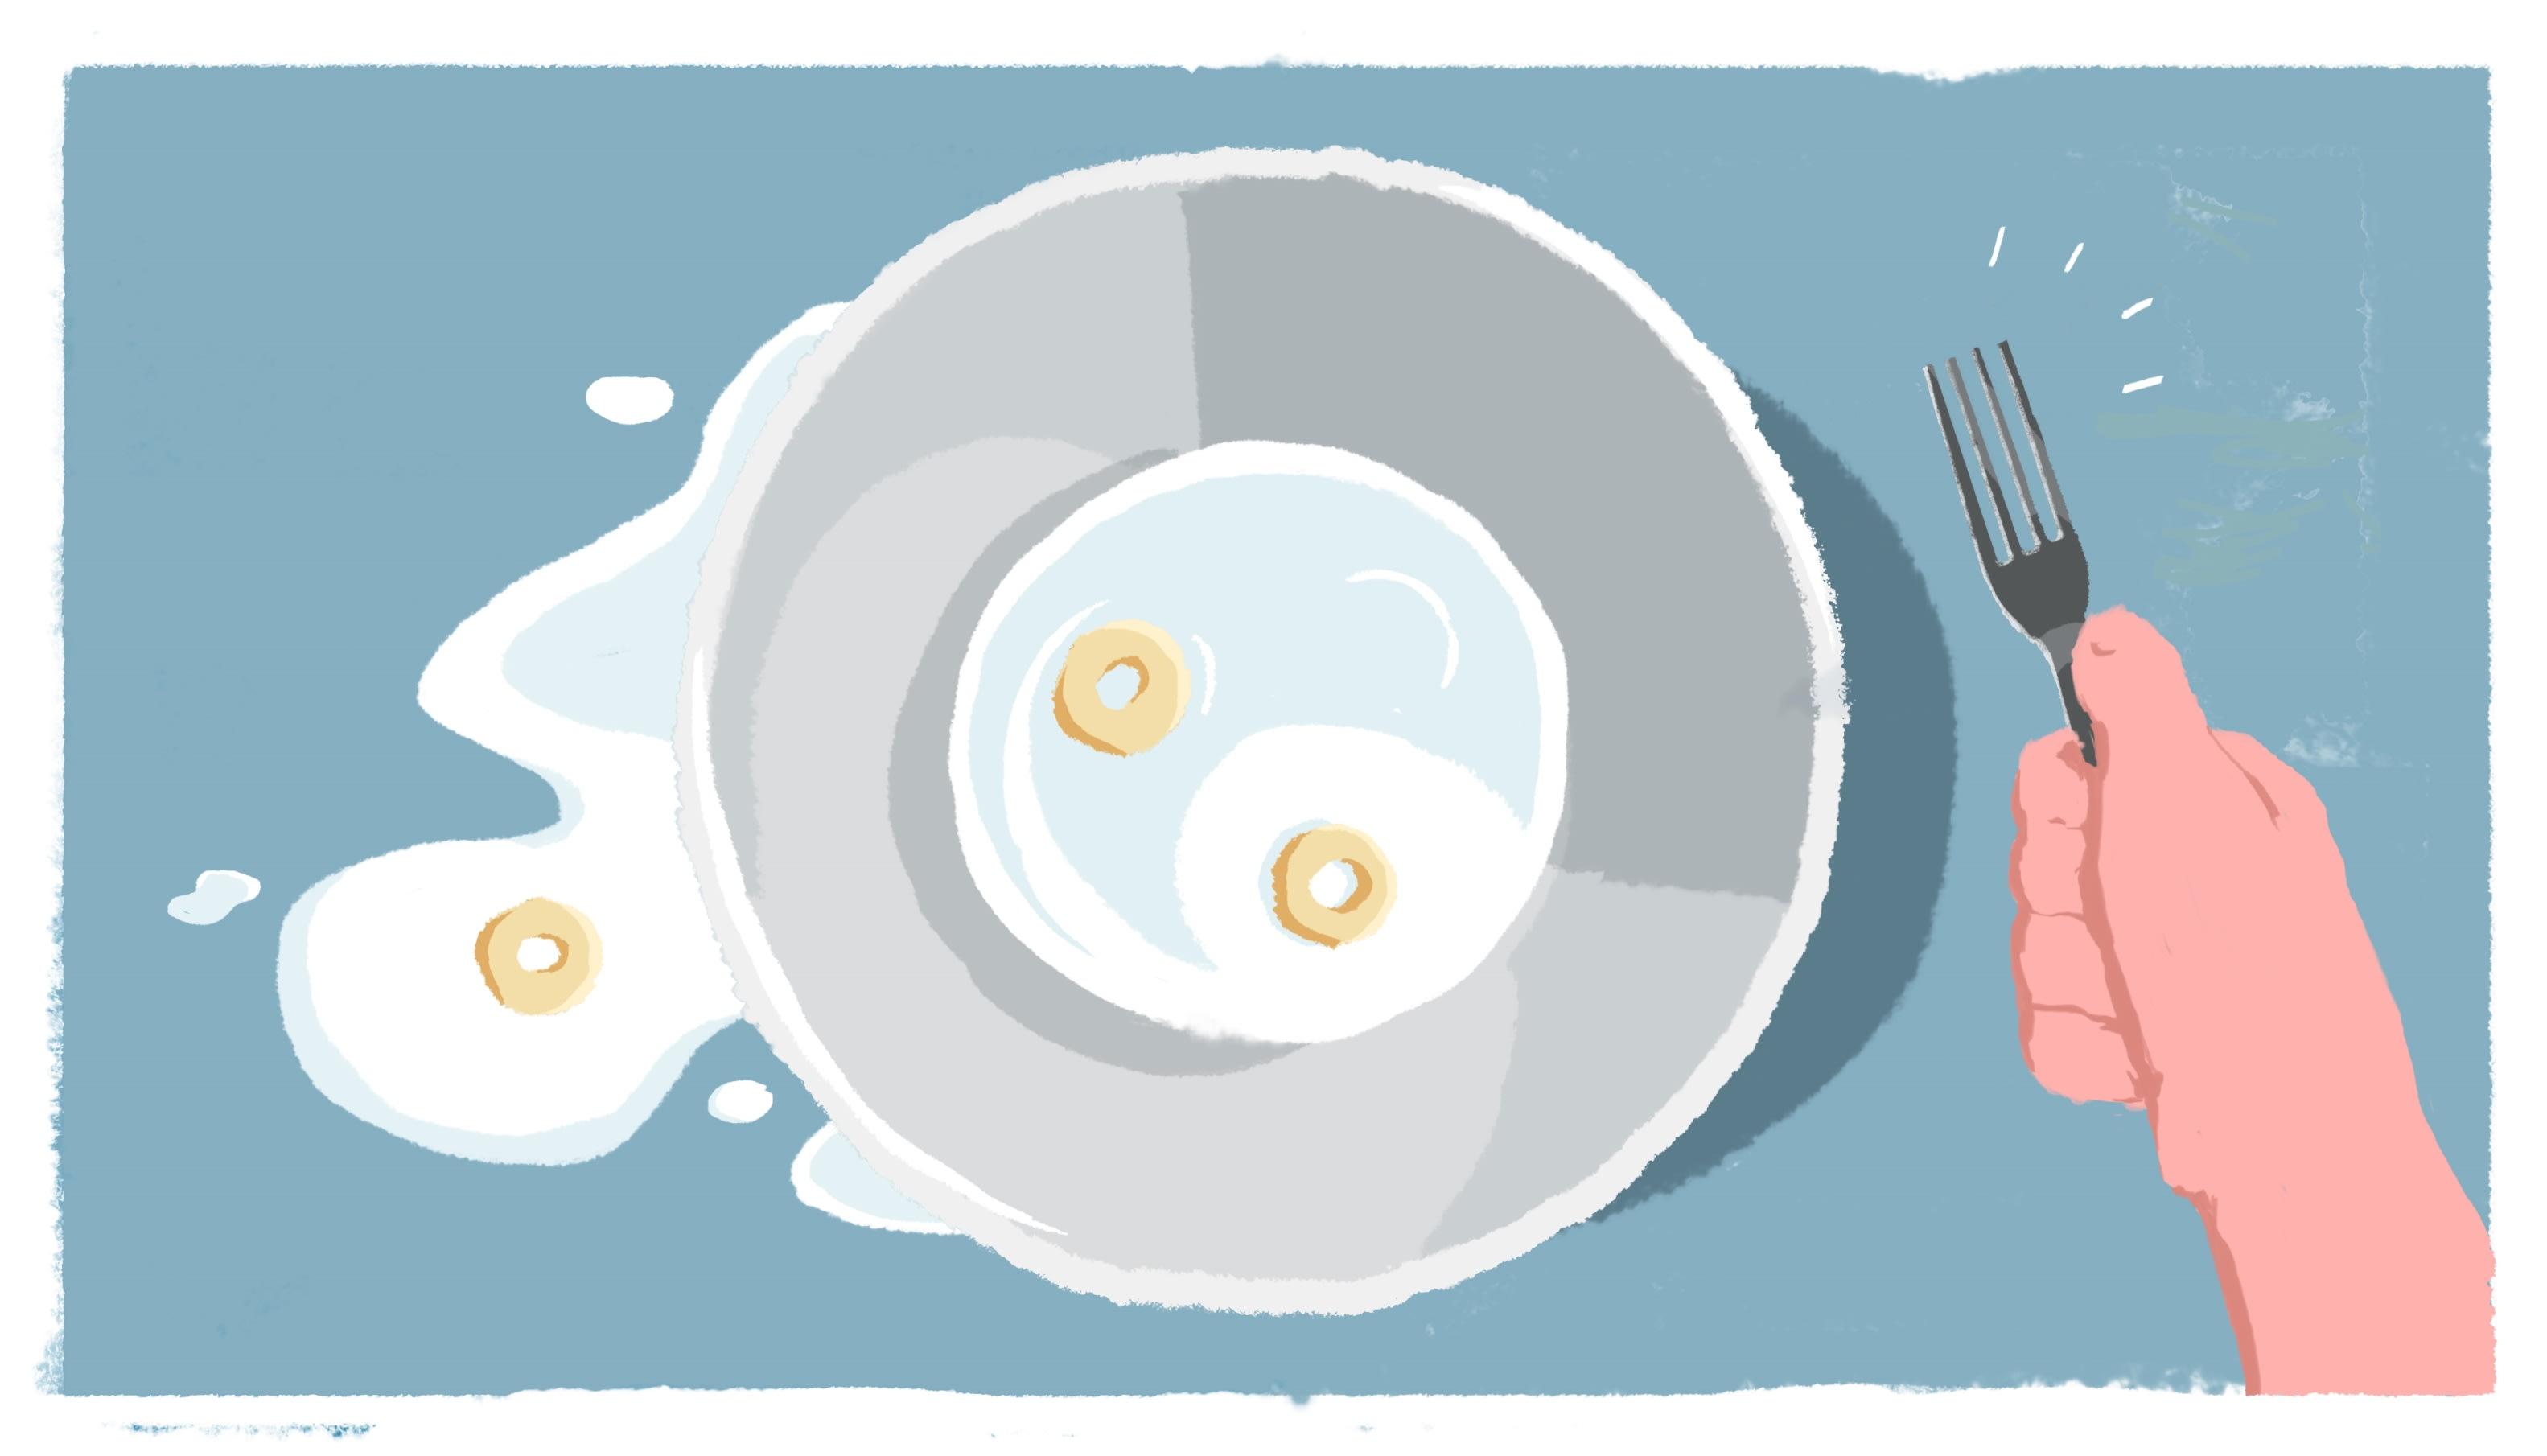 noble-trainer-illustration-cereal